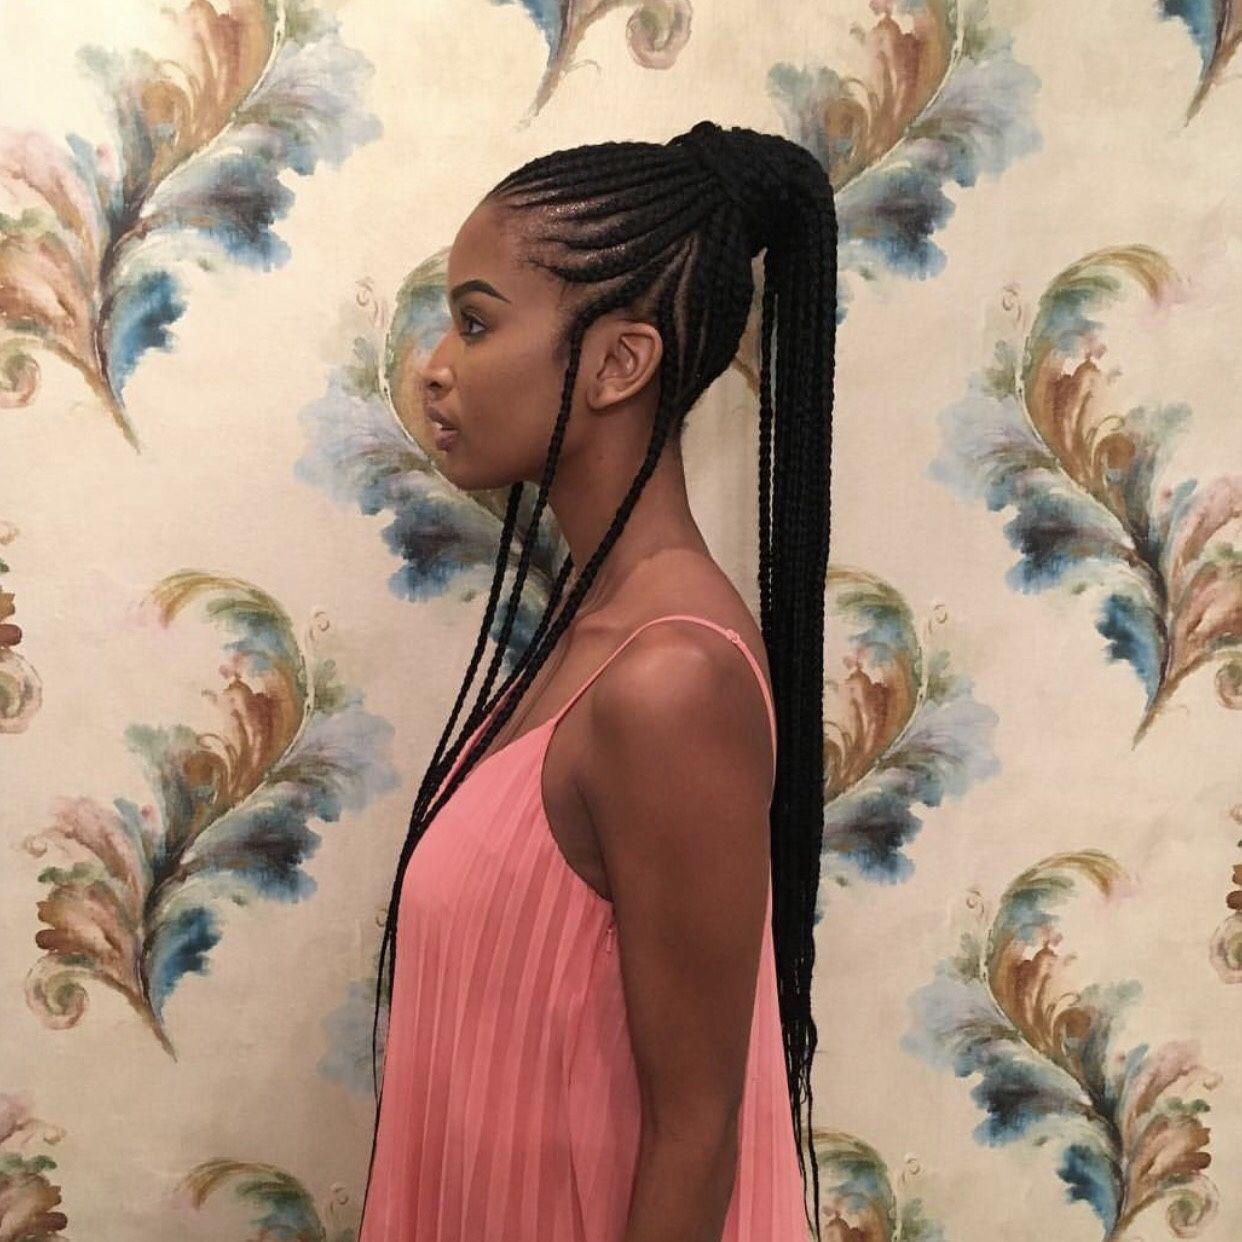 Braided Hairstyles for Little Girls hairstyleforblackwomen.net 129